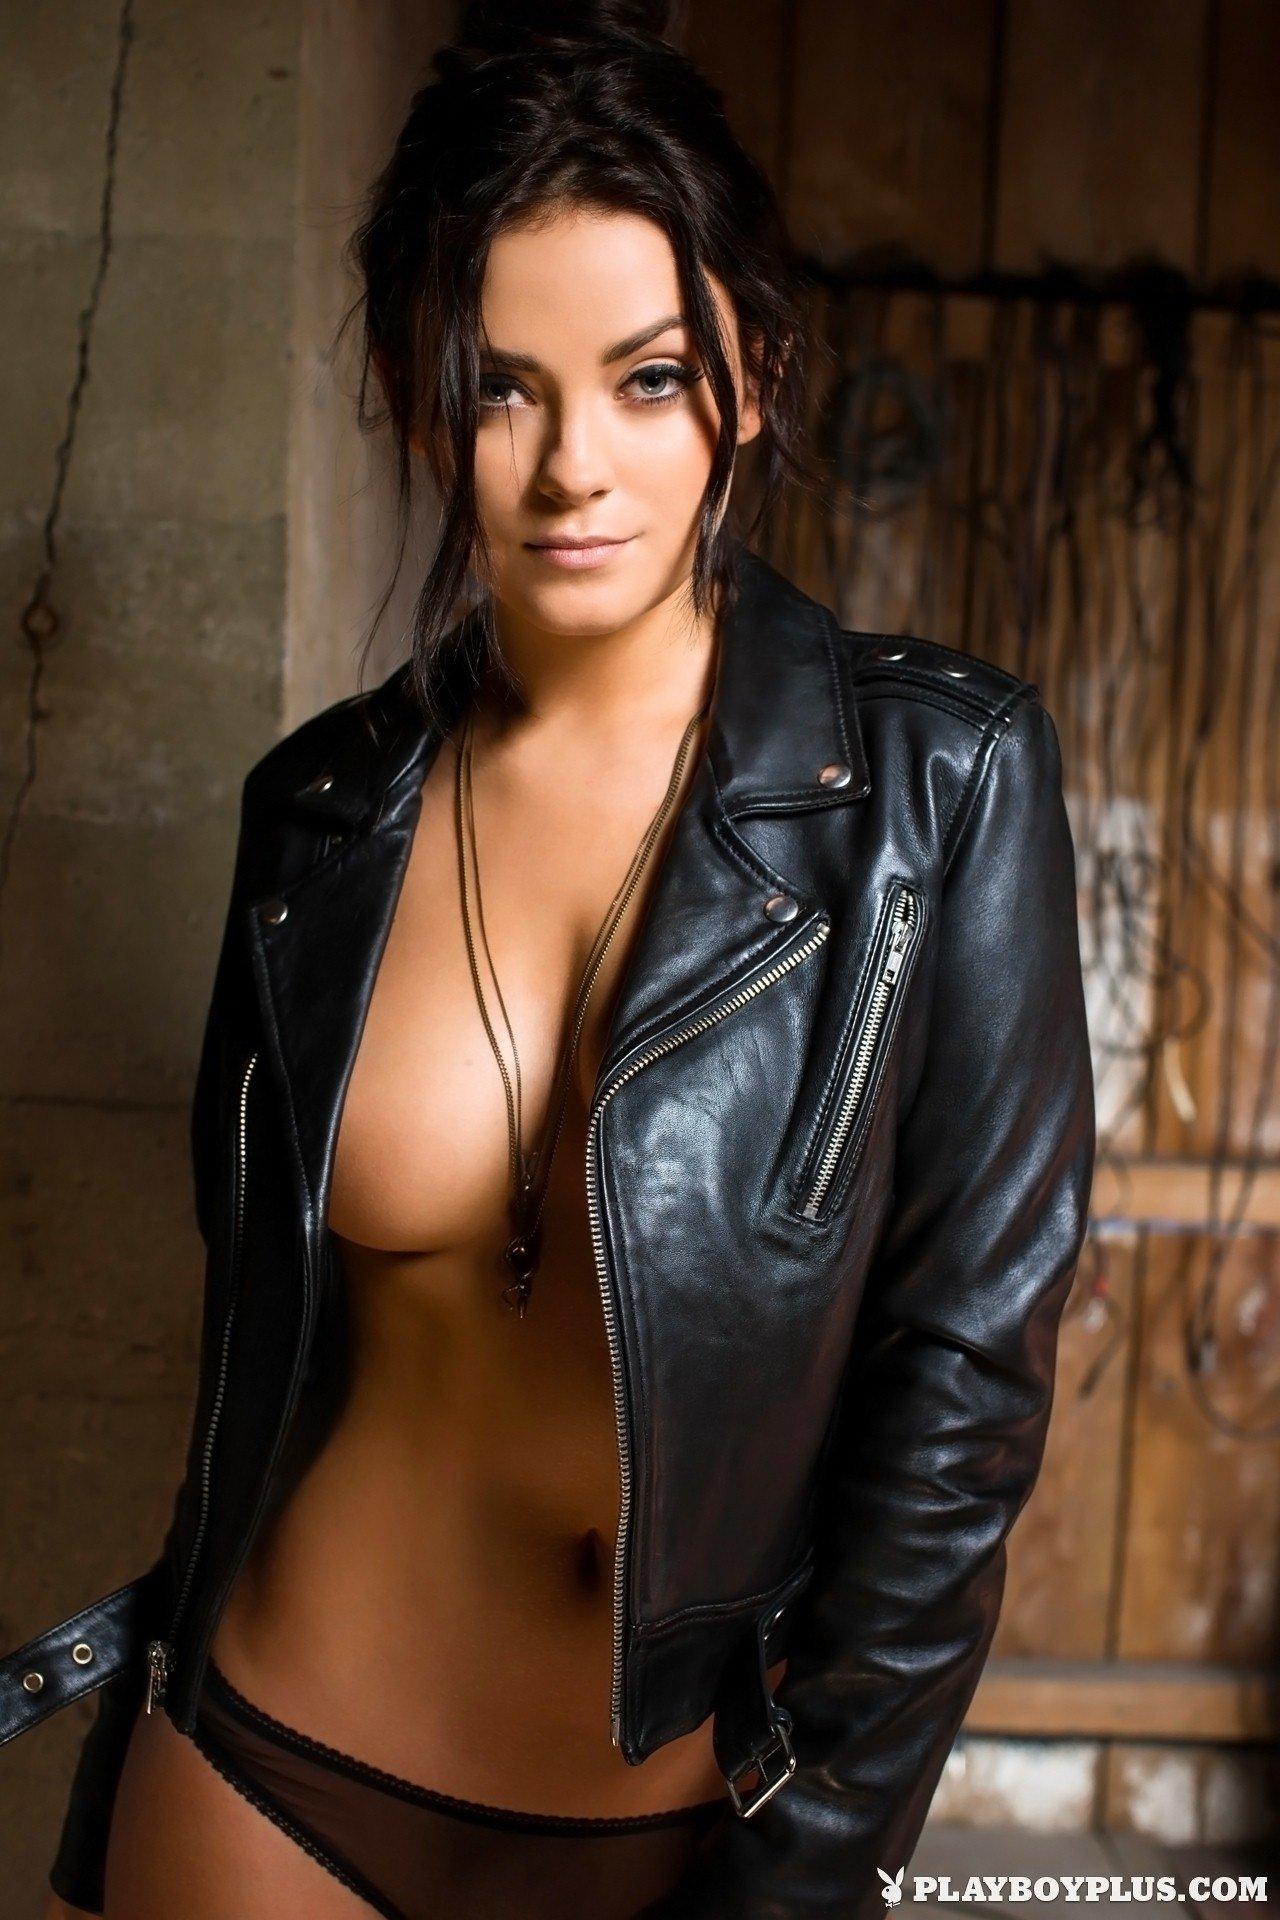 Alexandra Sokova Porn search results for 'alexandra'